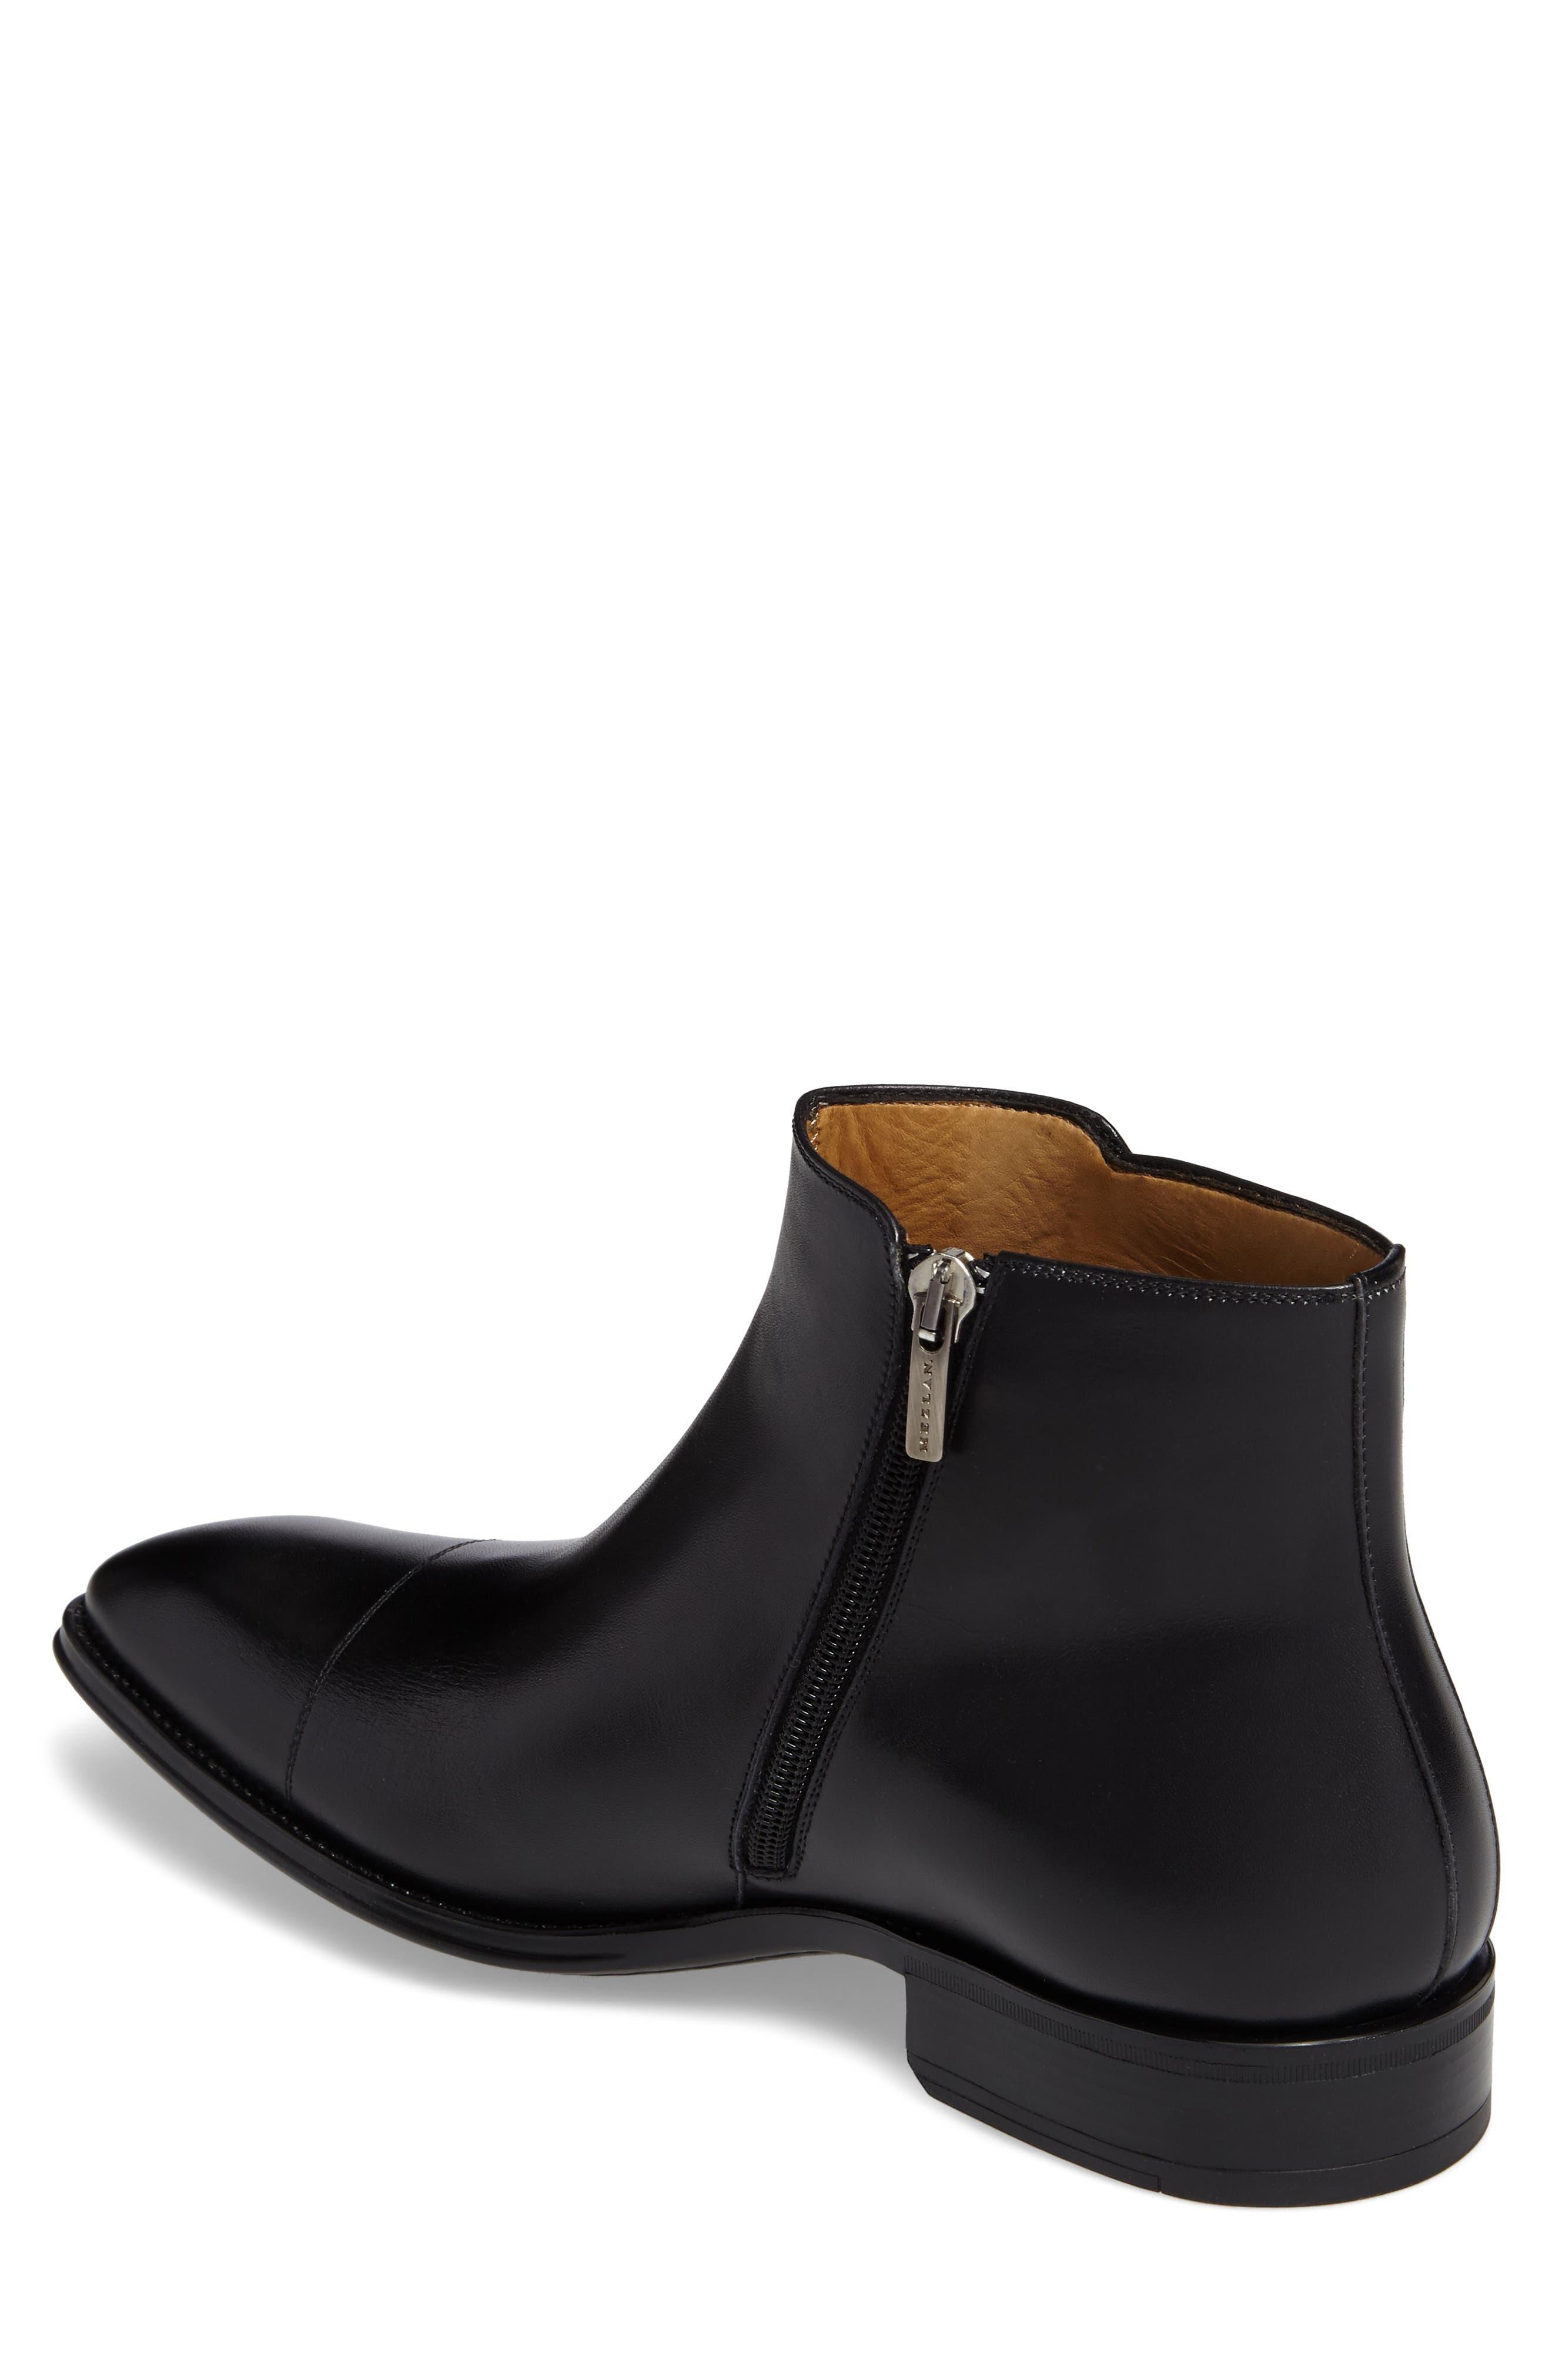 Casares II Zip Boot,                             Alternate thumbnail 2, color,                             Black